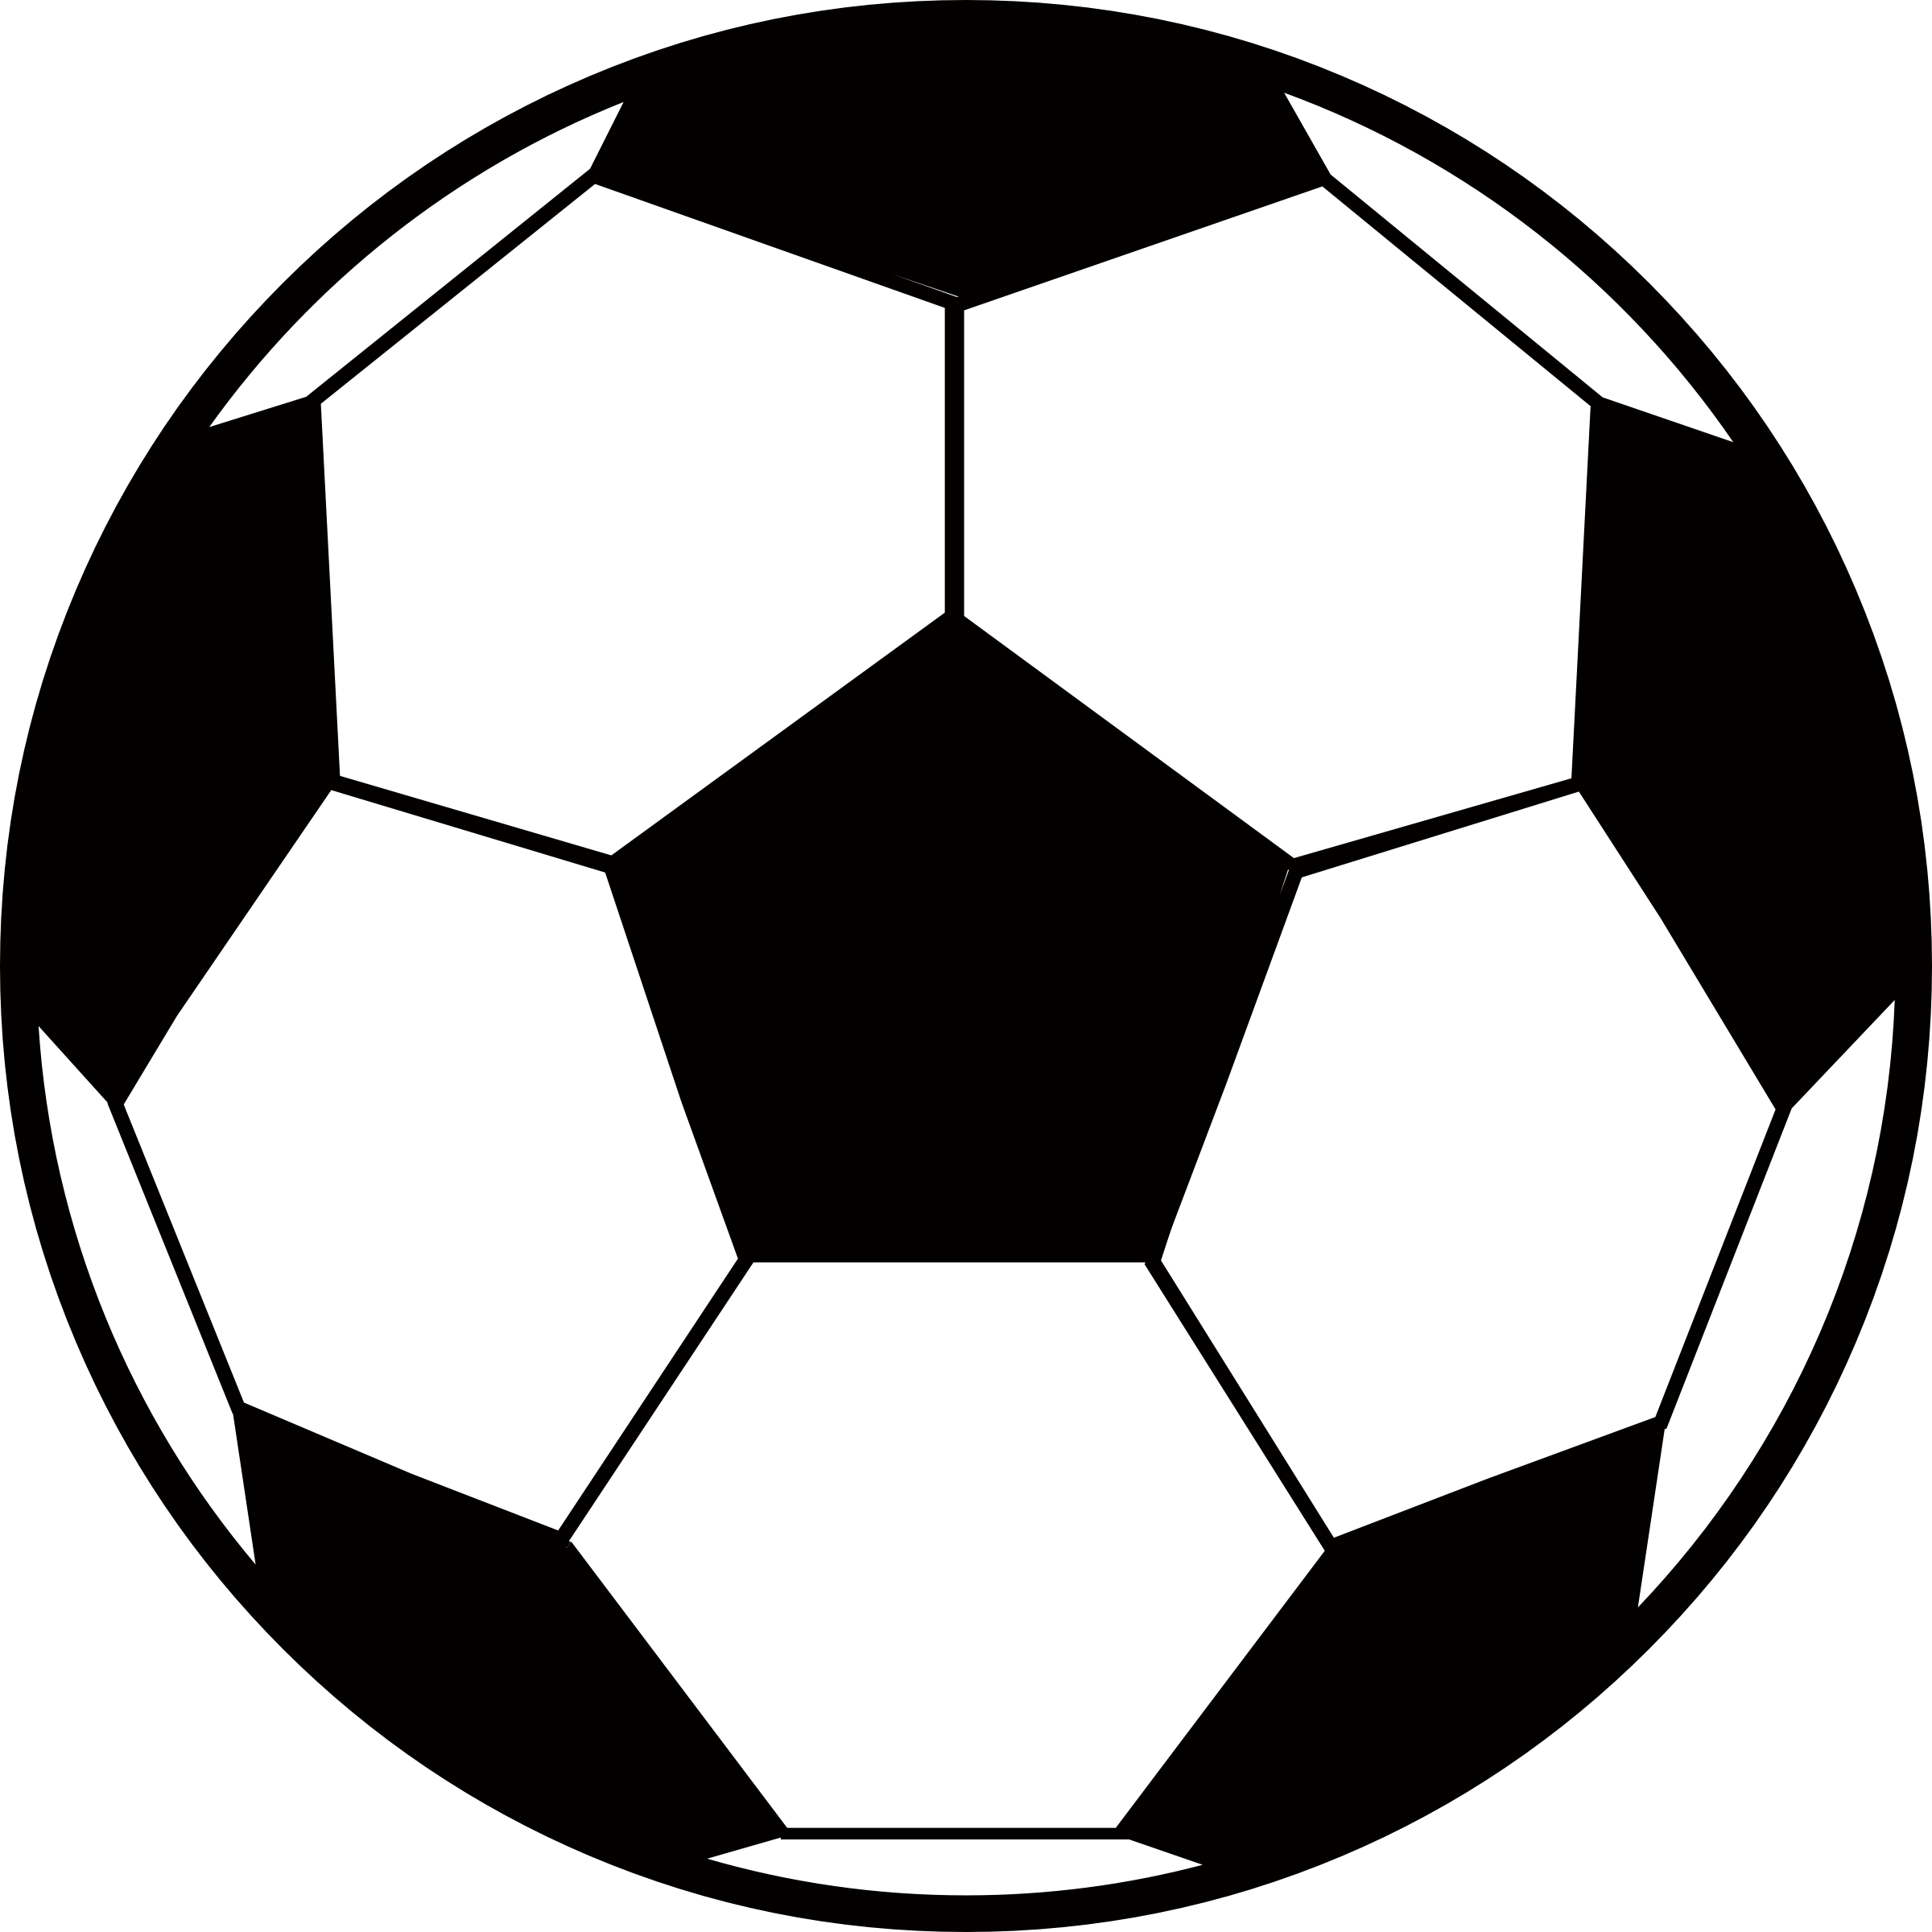 Clipart ball soccer. Images of balls transparent